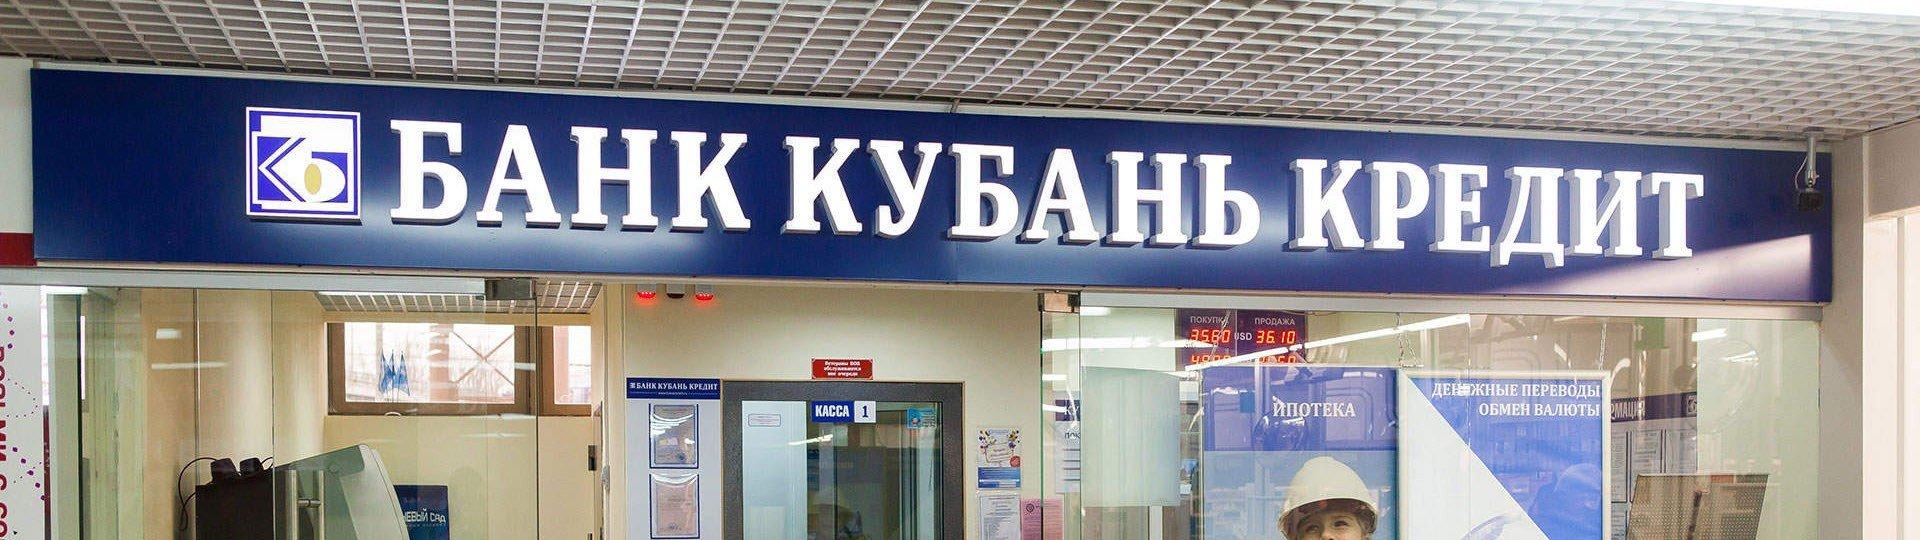 ООО КБ Кубань Кредит